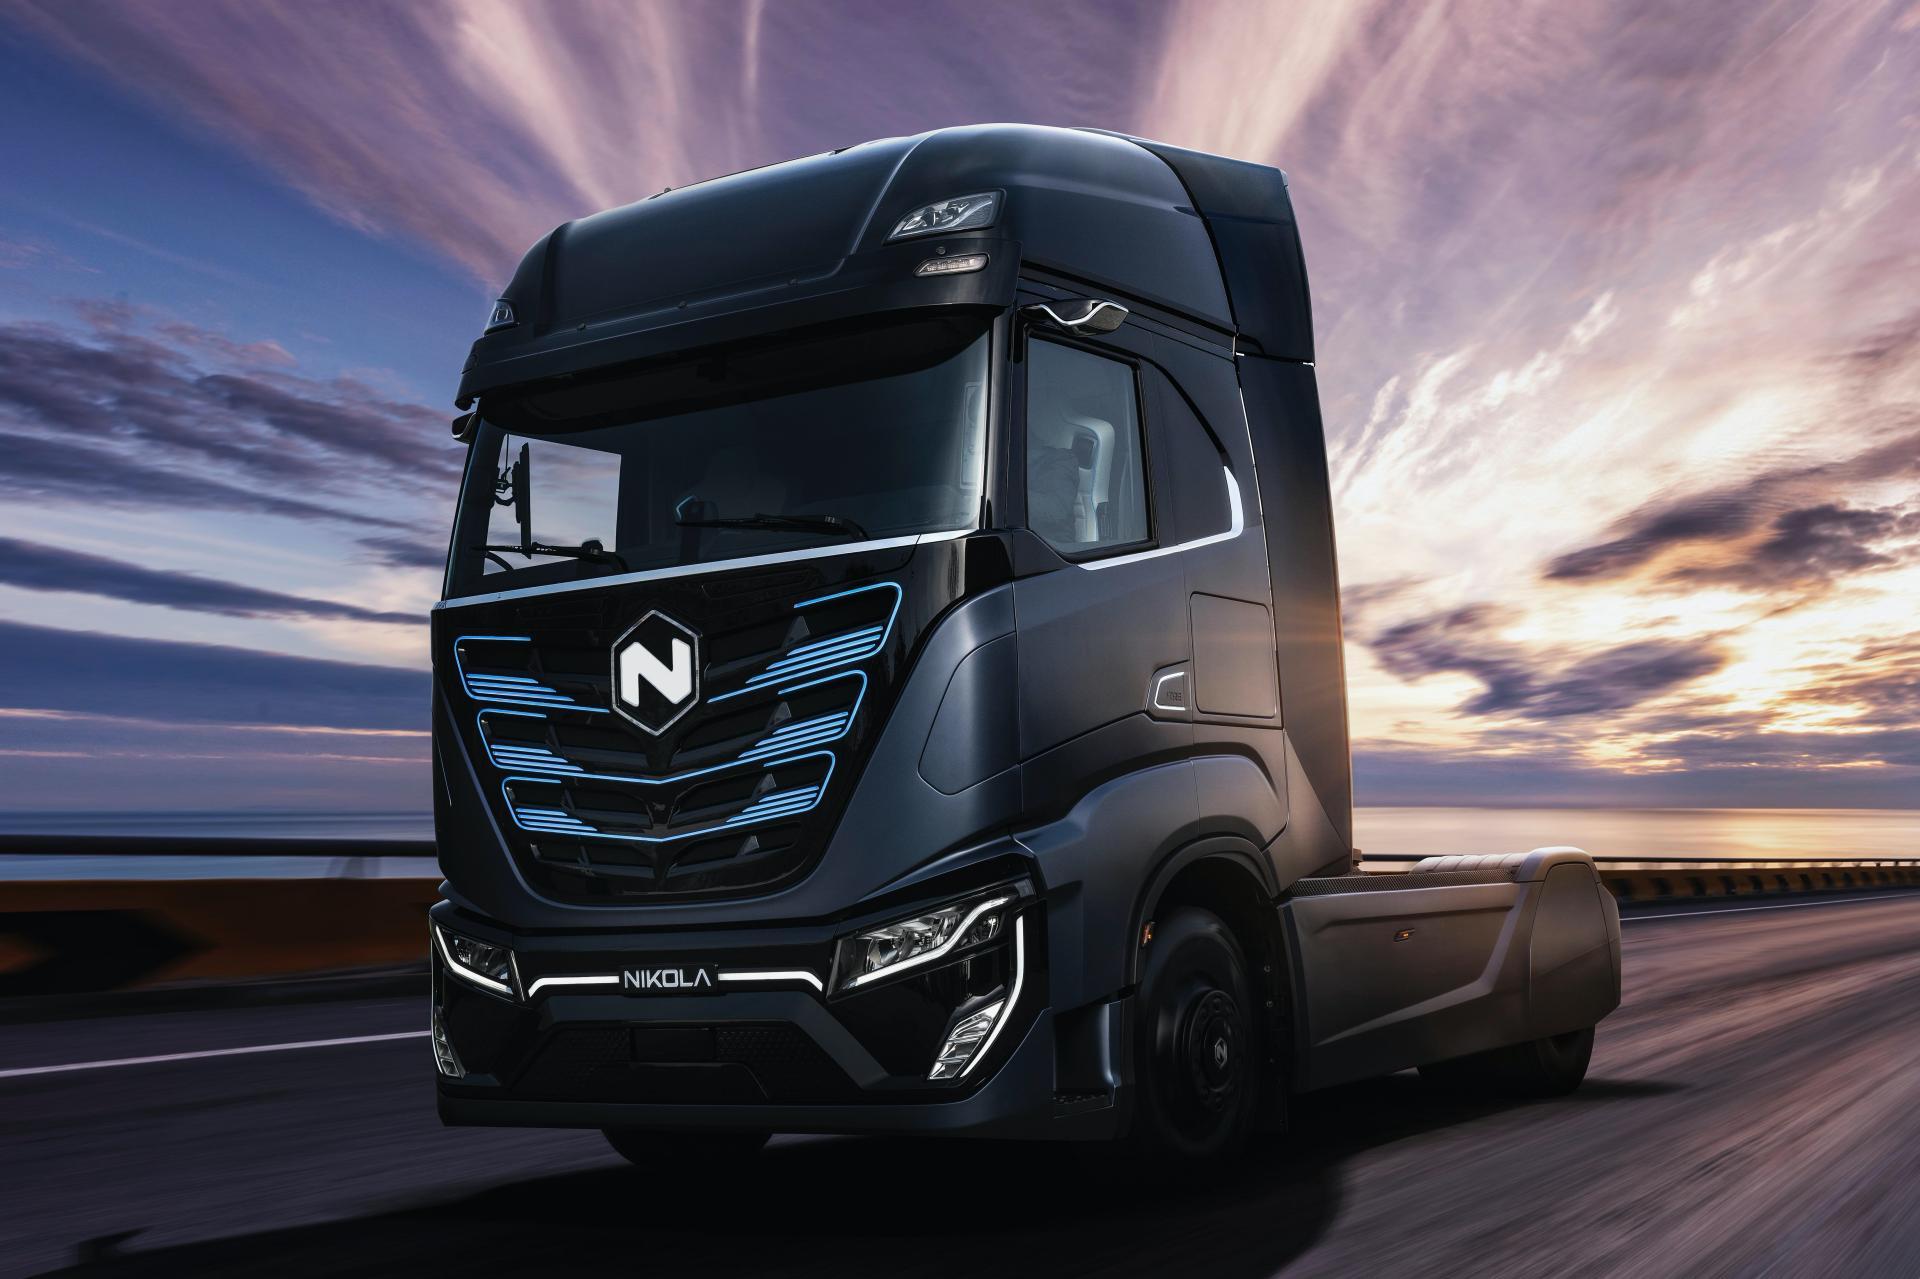 Nikola-TRE-electric-truck-5